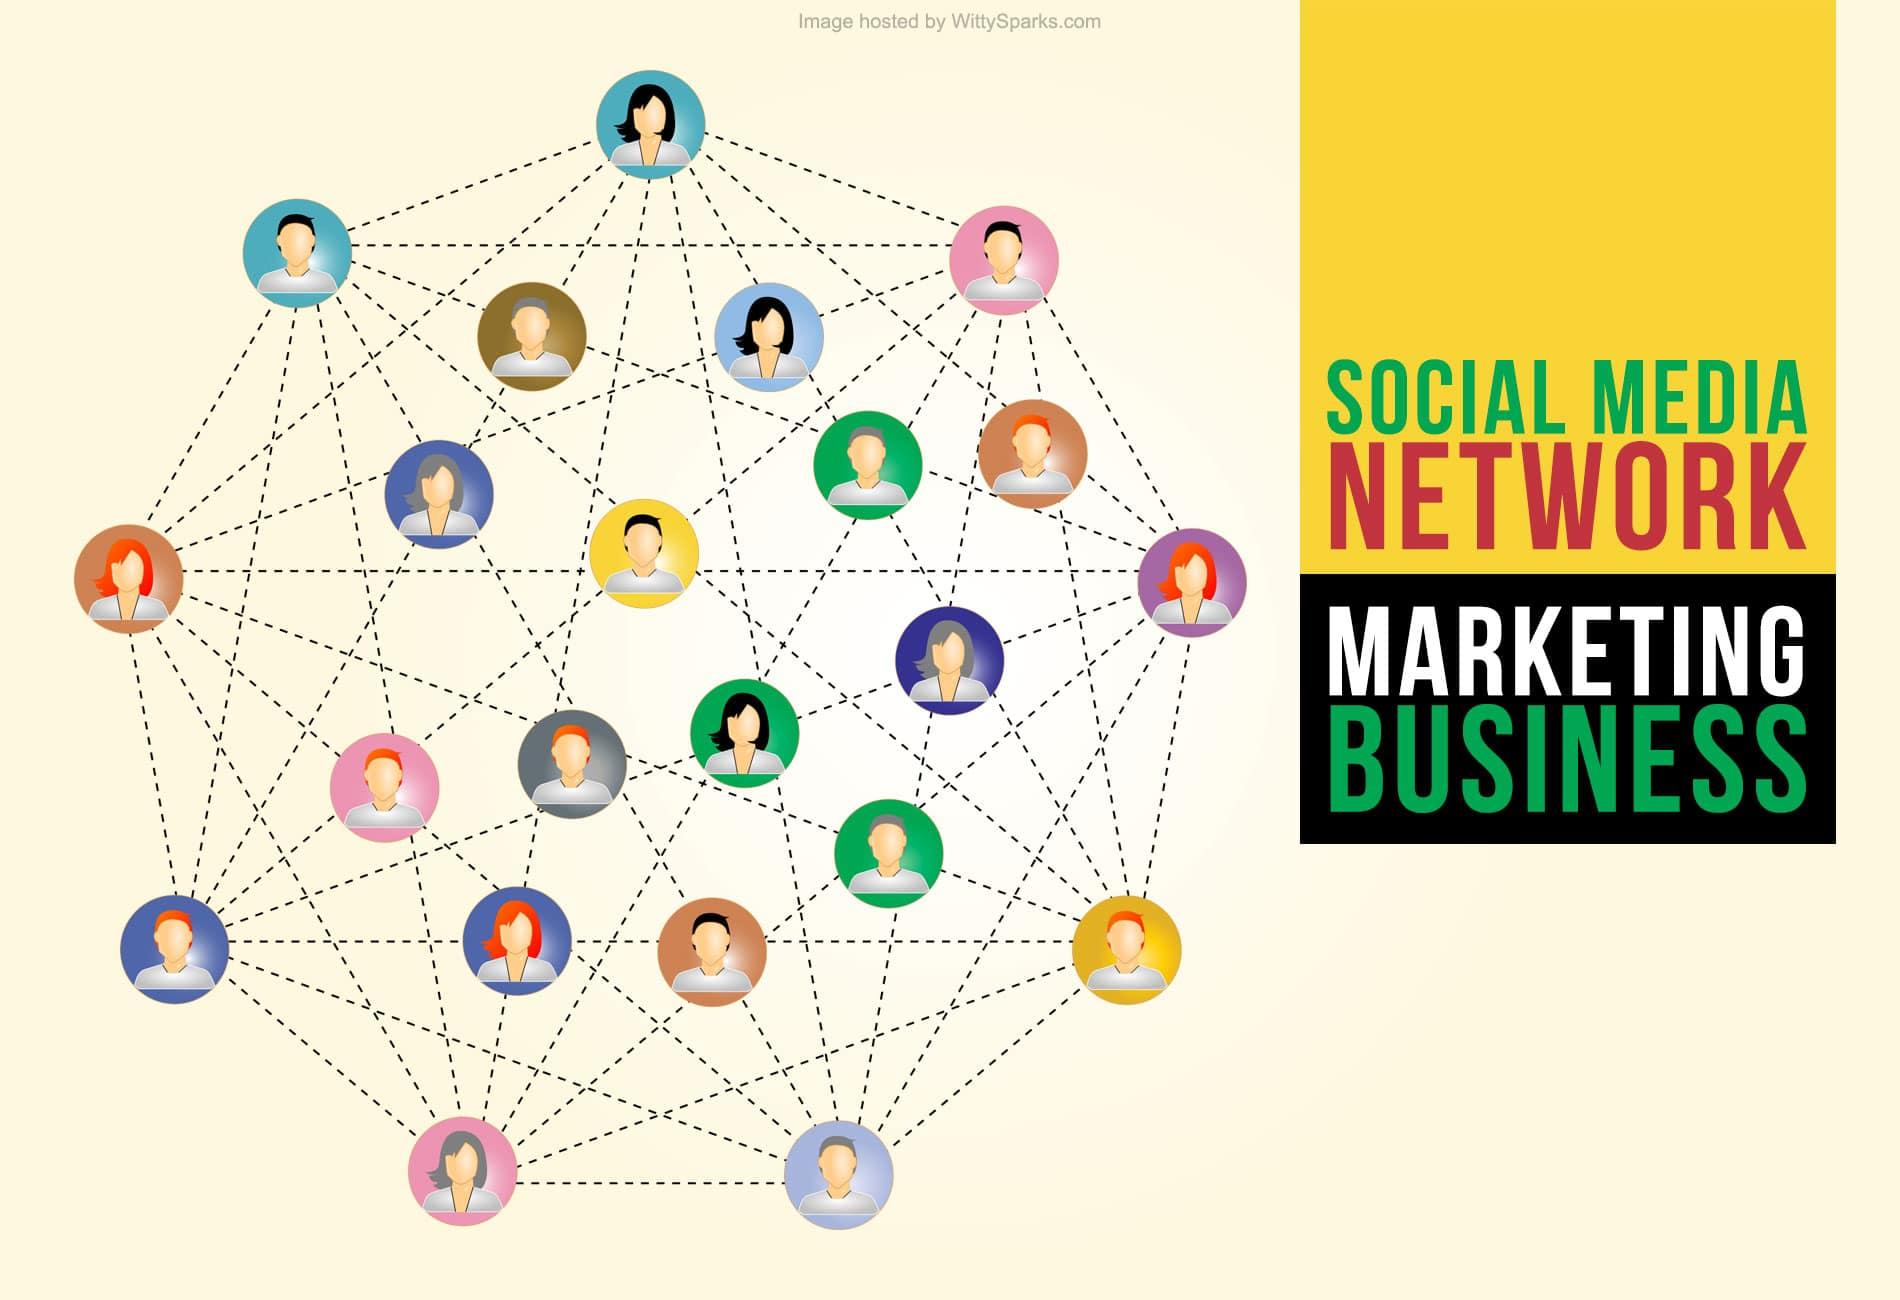 Social Media Network Marketing Business